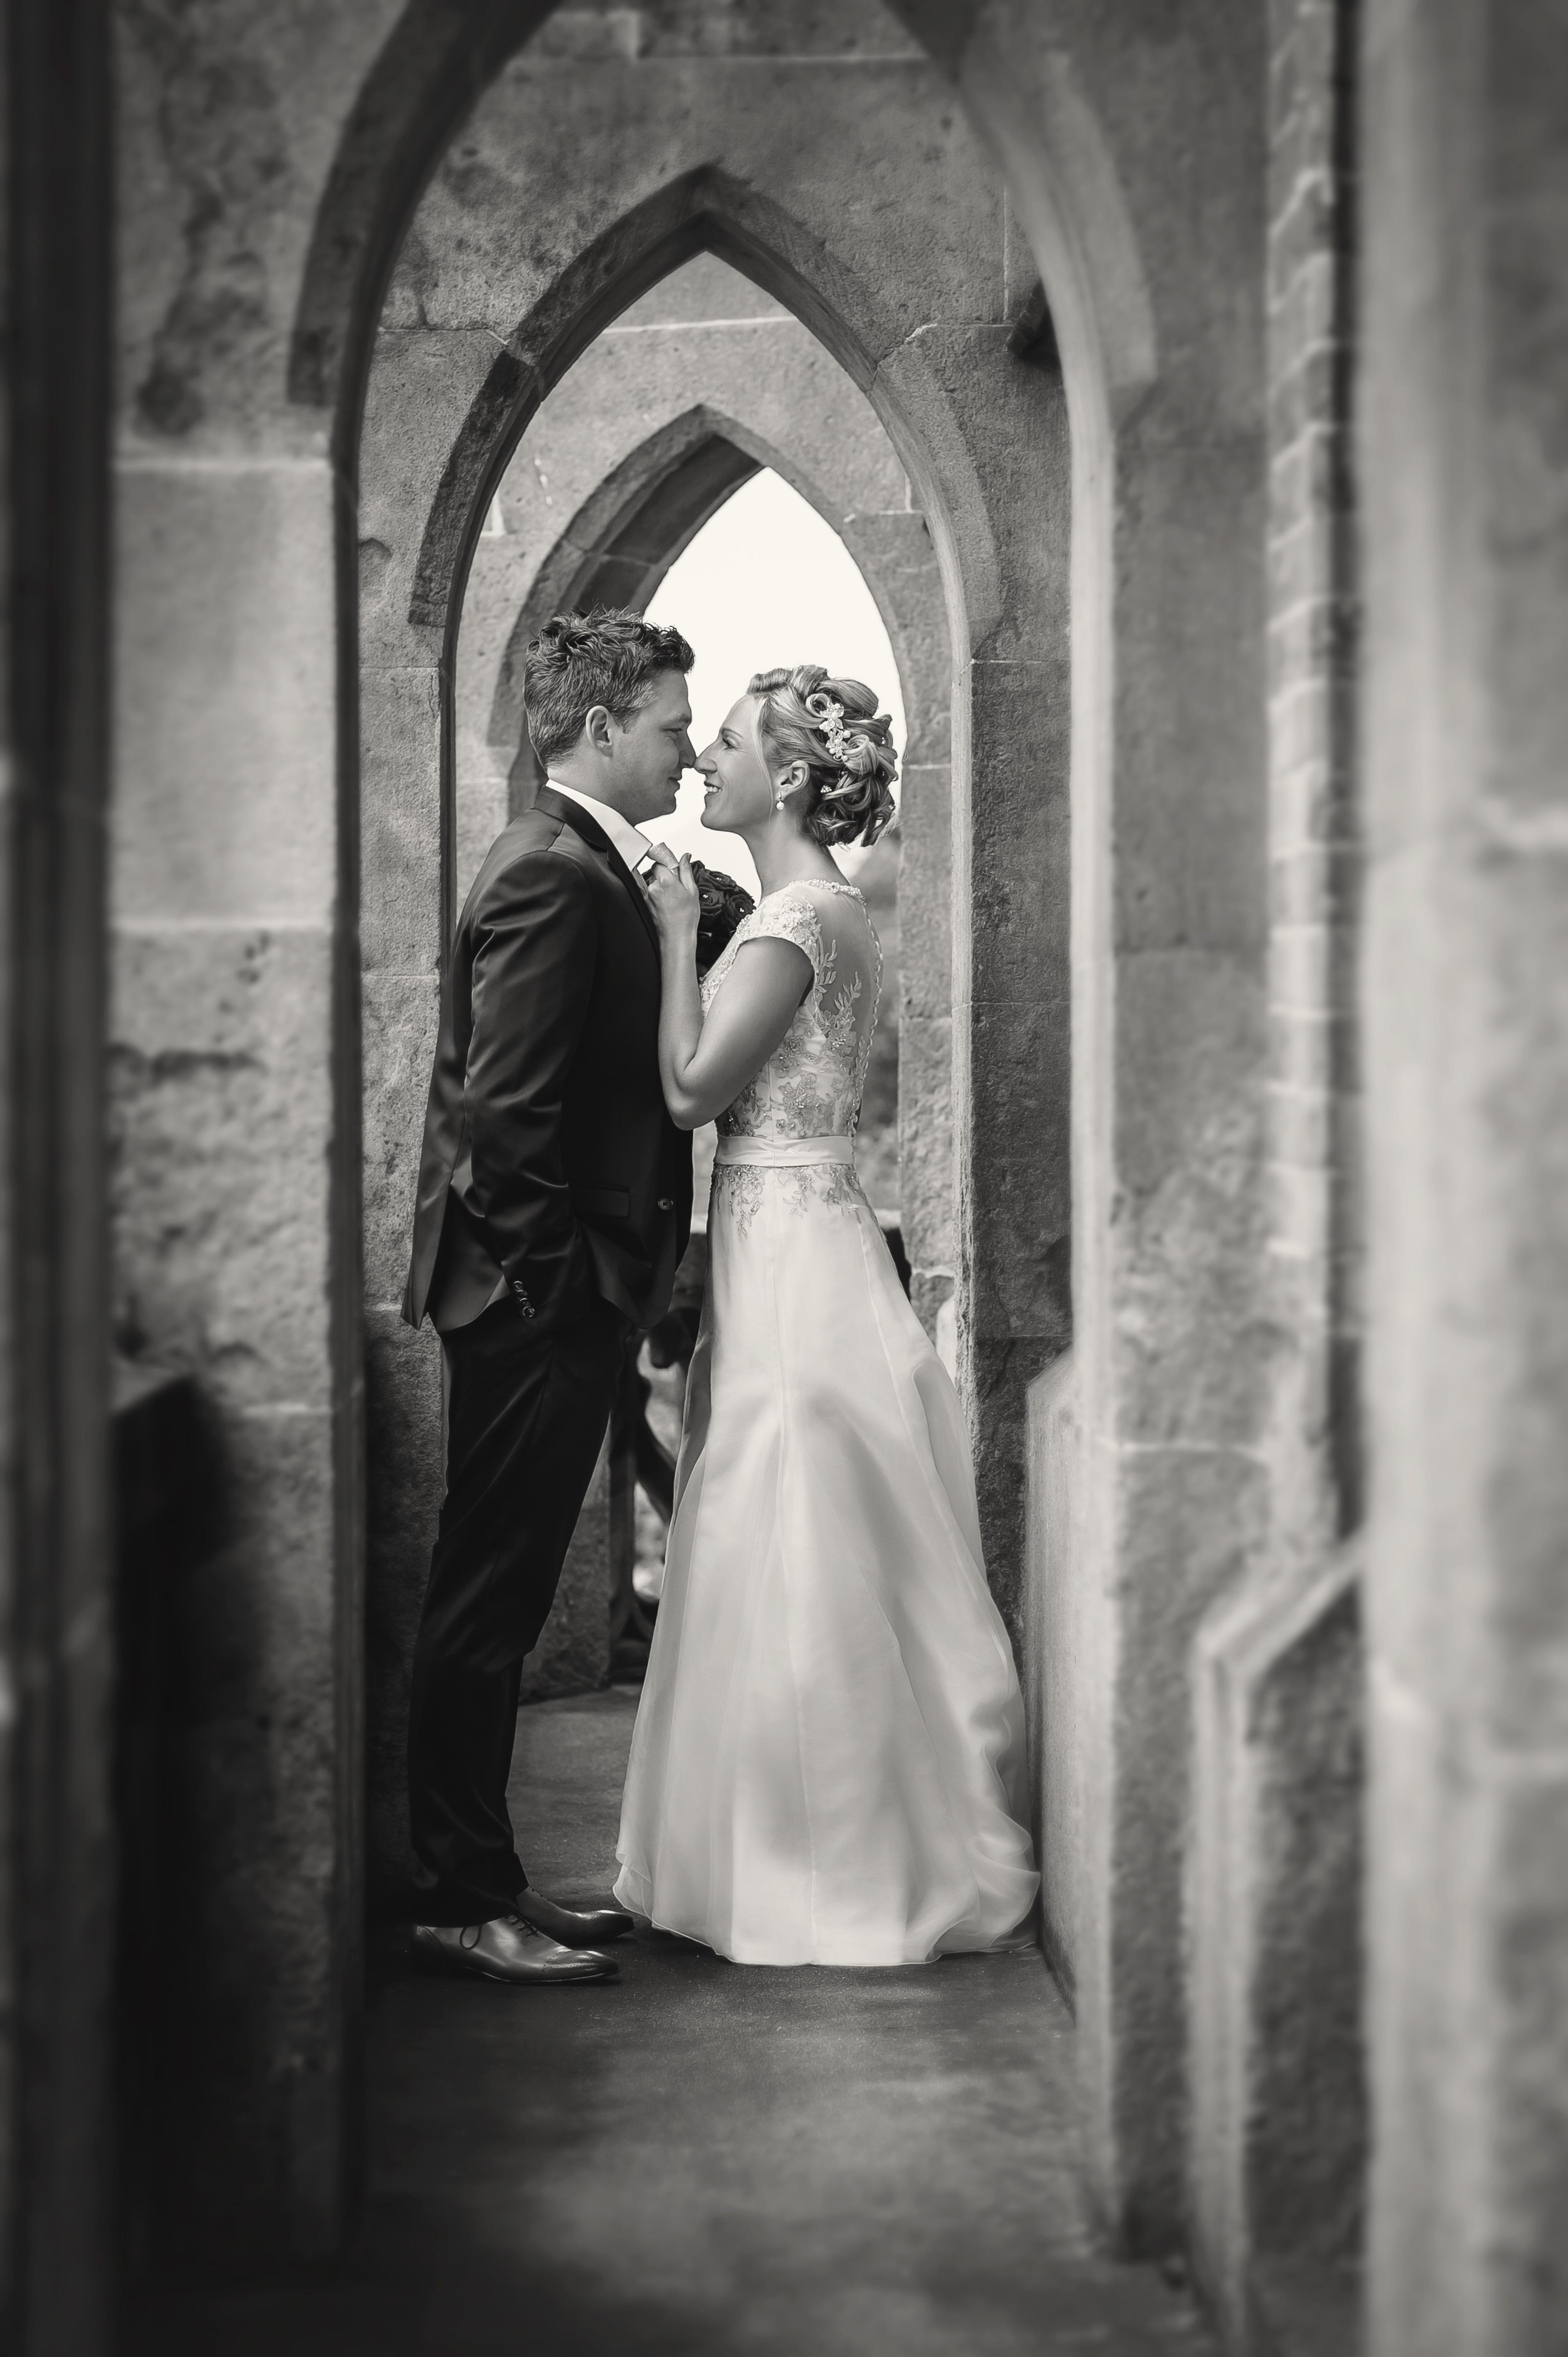 ElsnerFotografie_Hochzeitspaarportraits_C&G_DSC_3708_sw